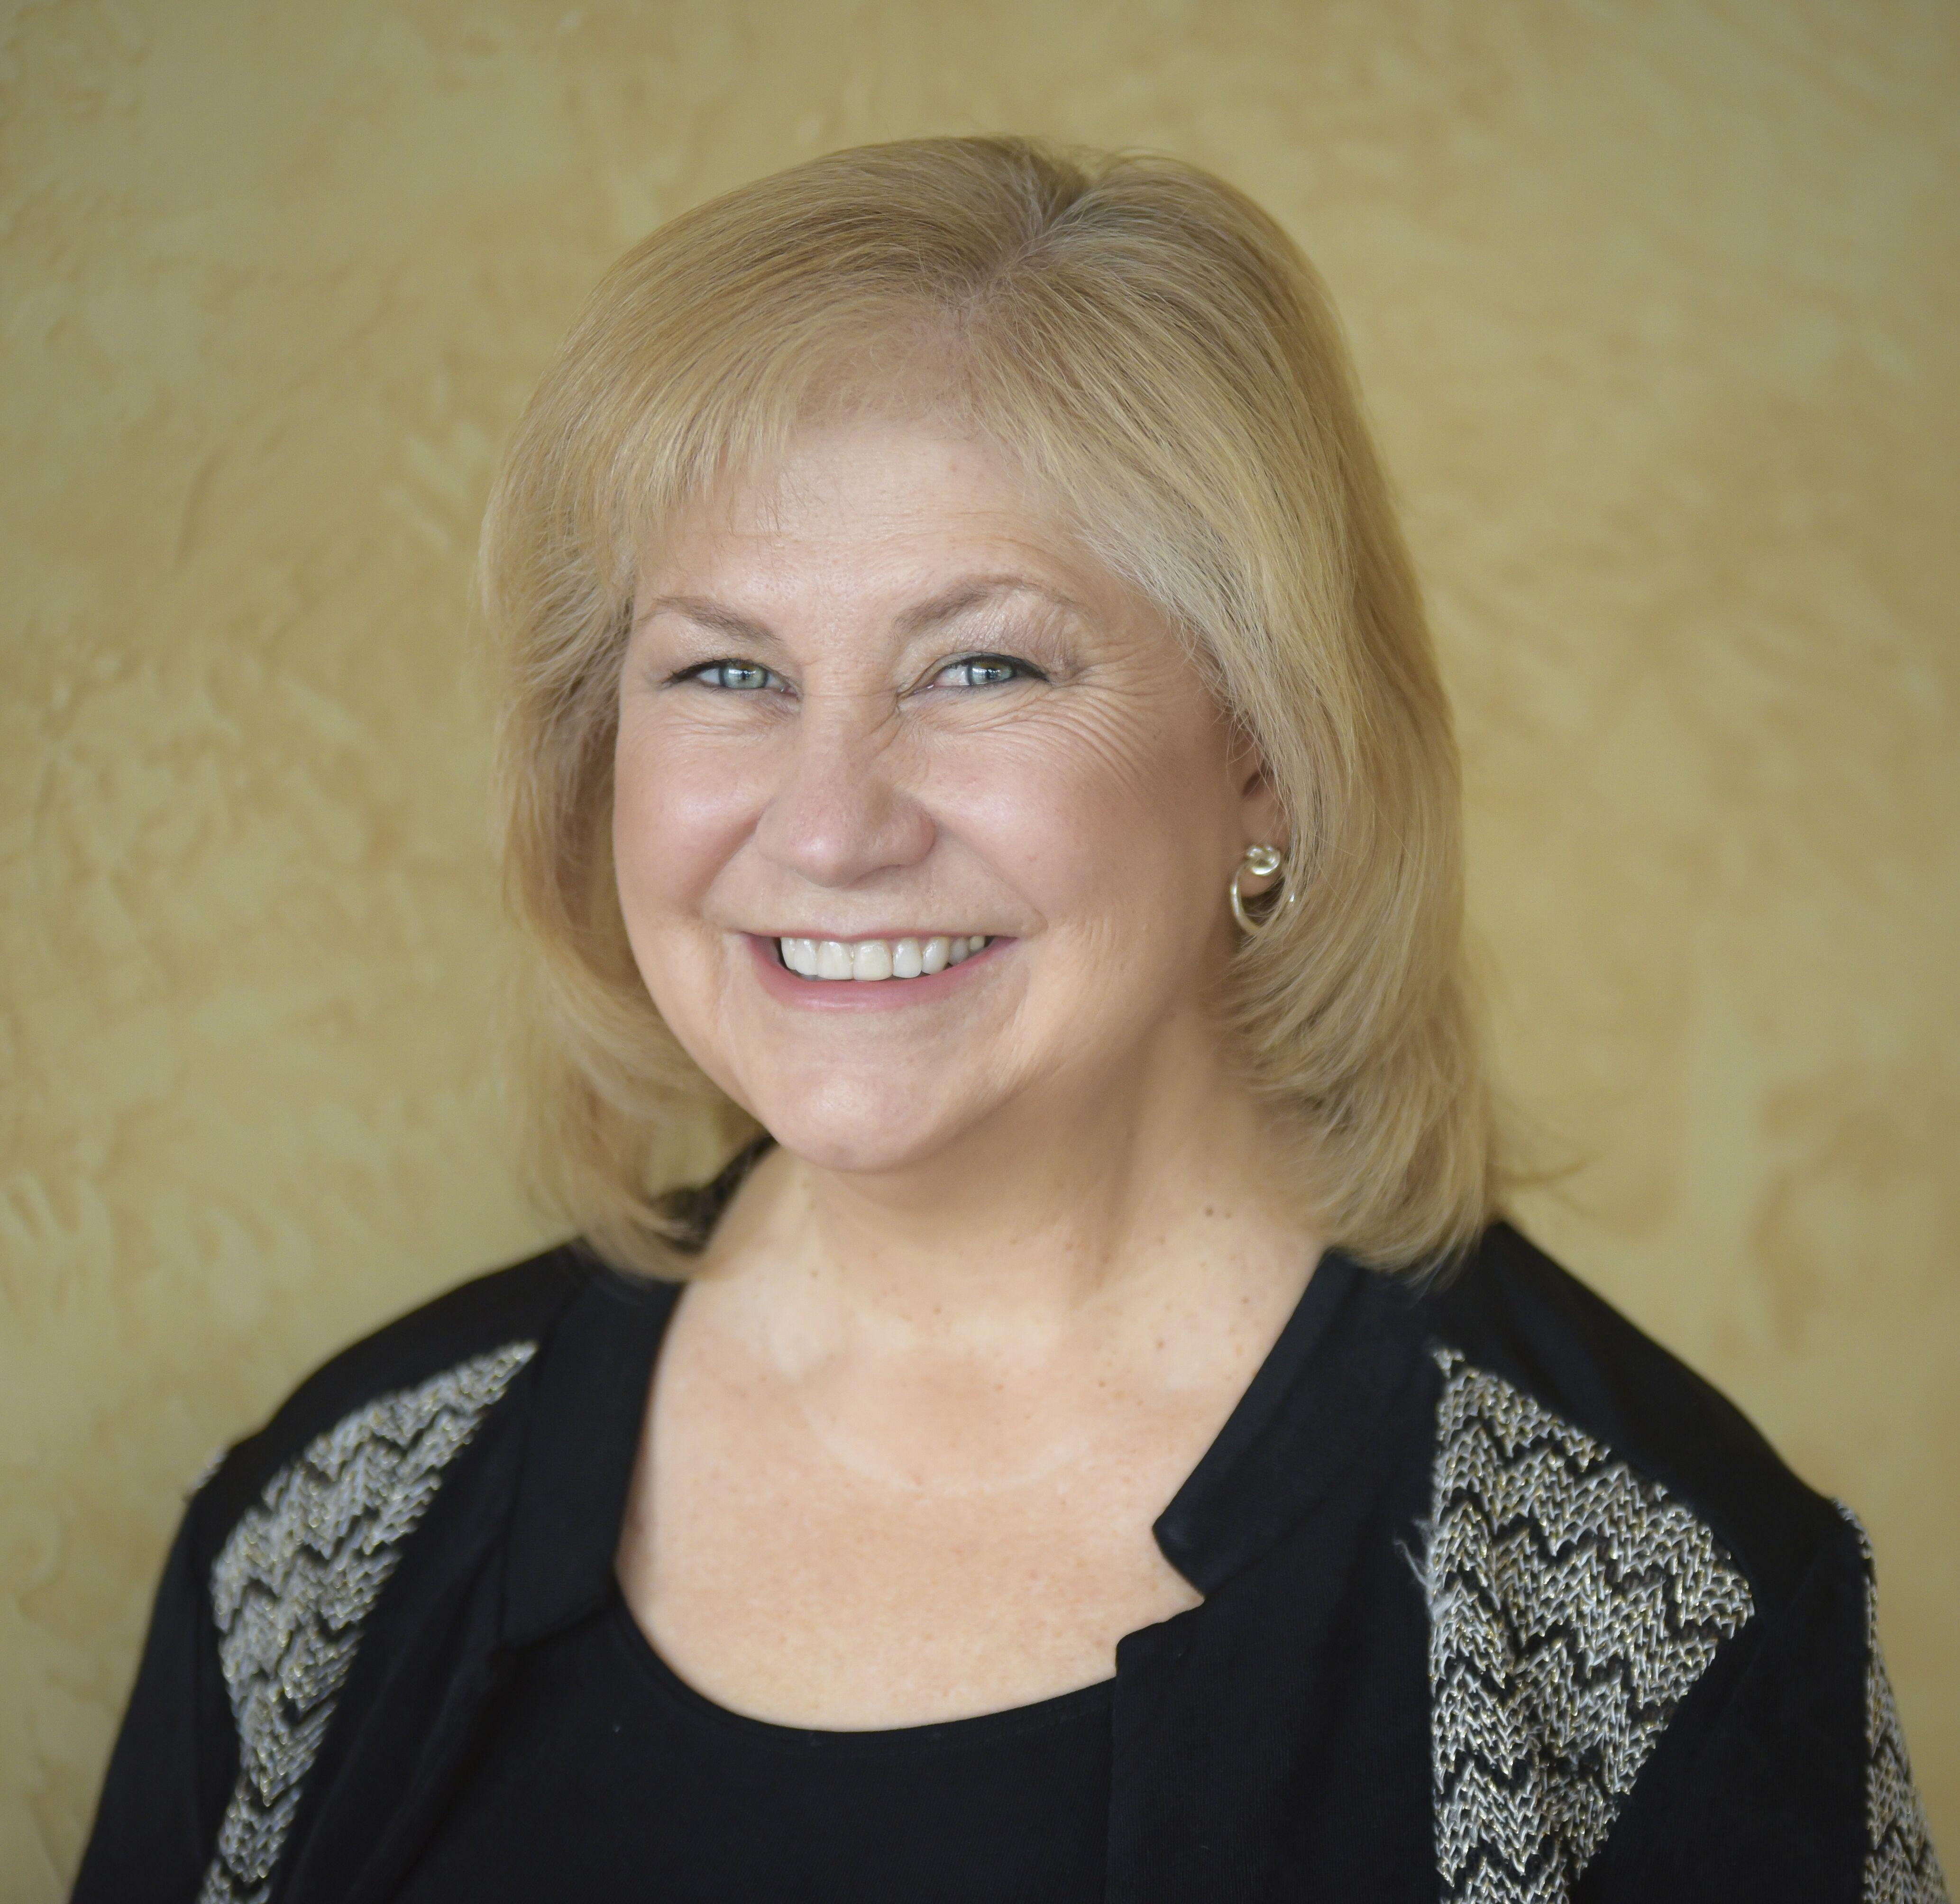 Lori A. Thompson